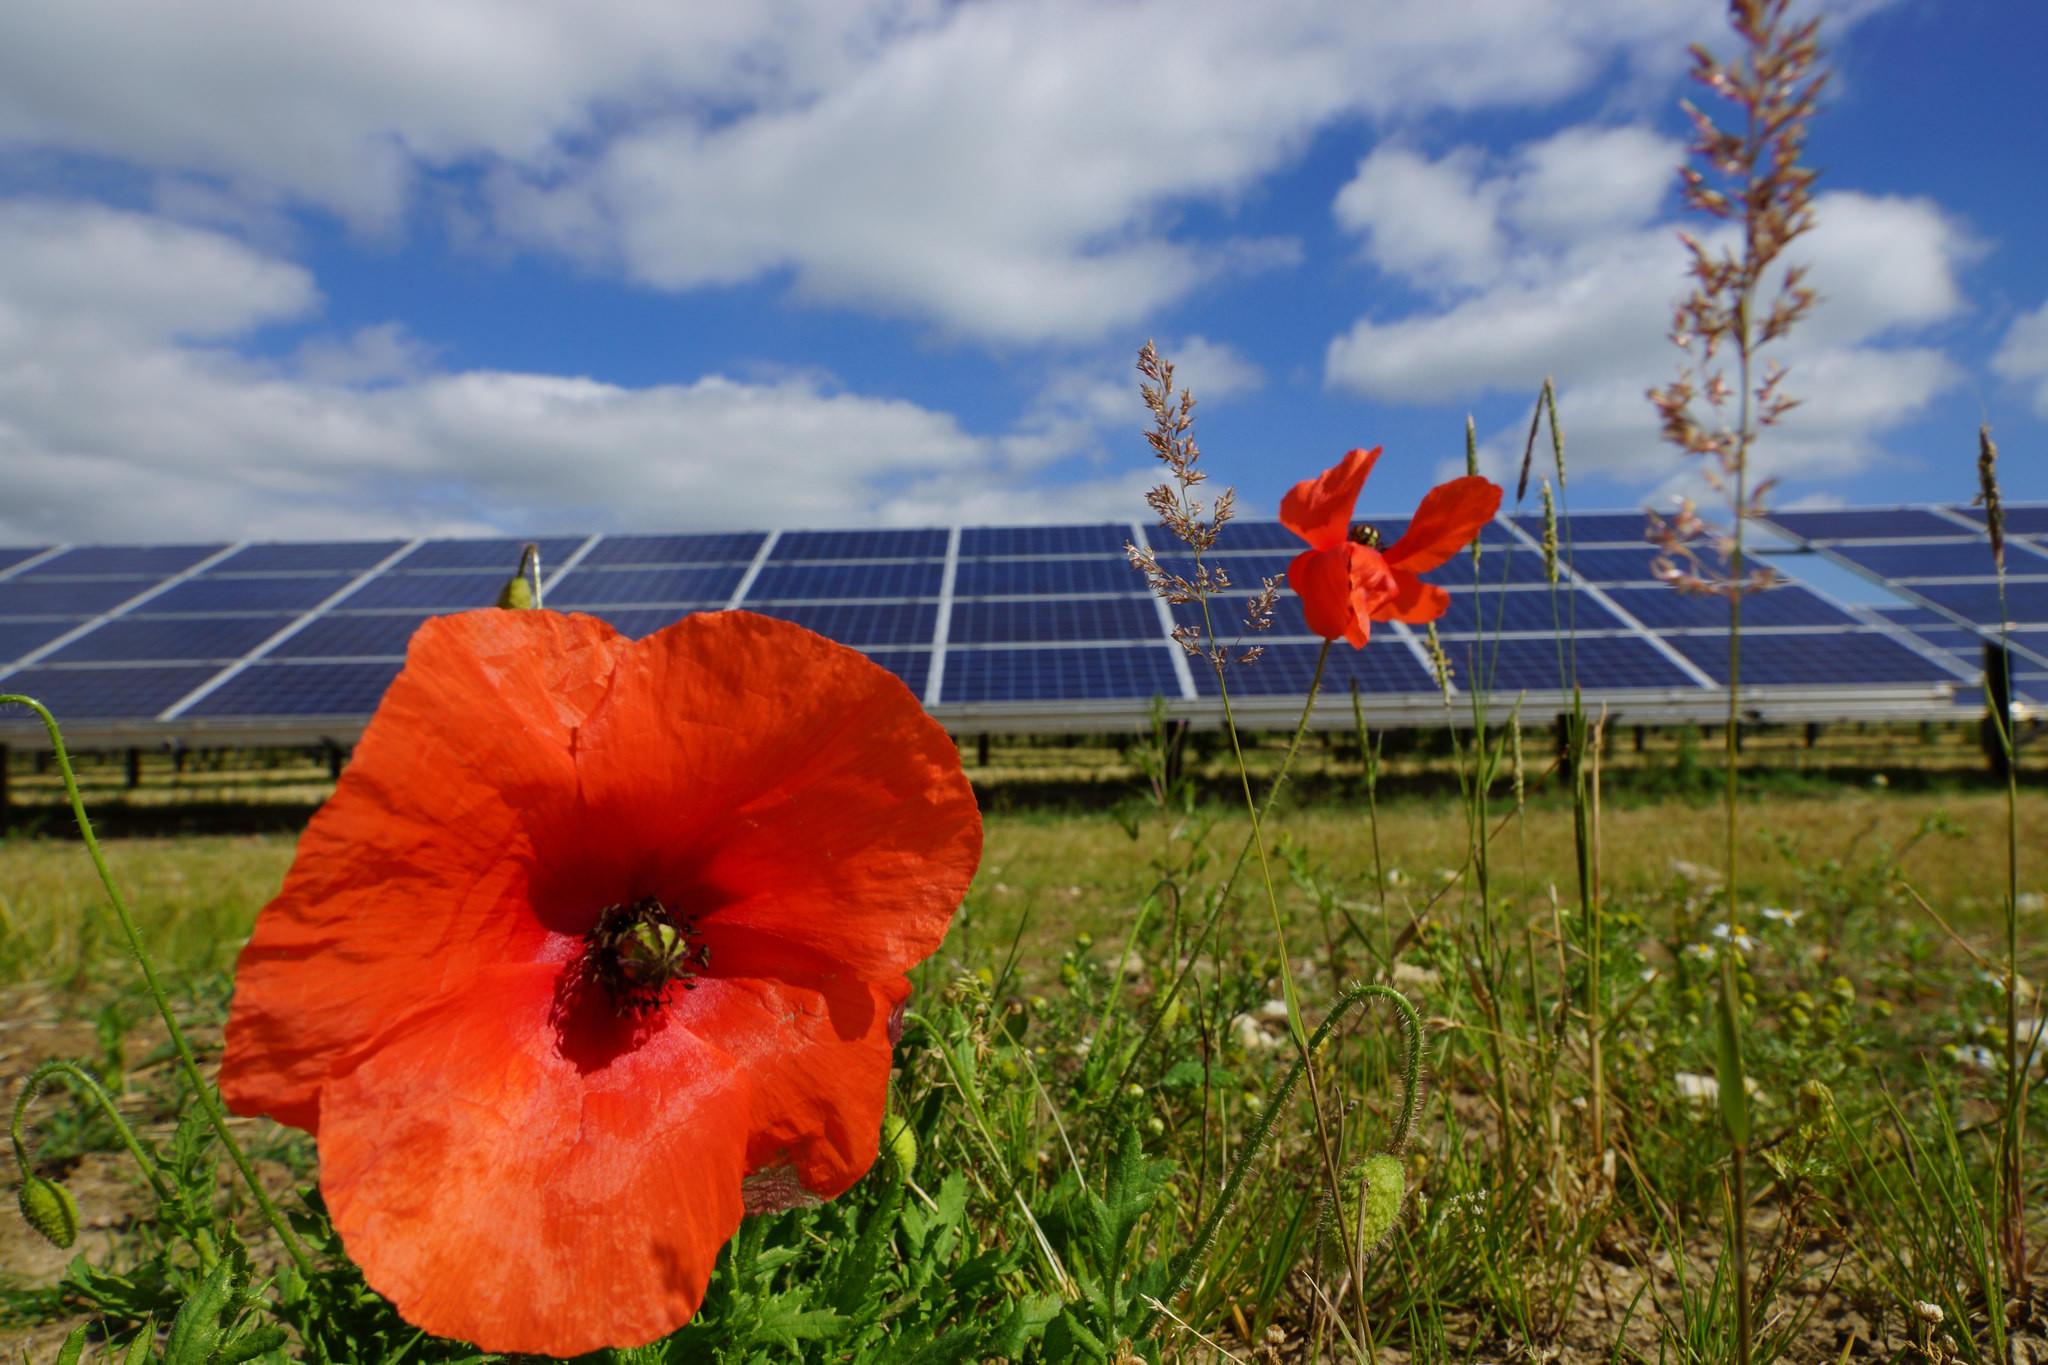 "<p>Фото &copy; <a href=""https://www.flickr.com/photos/126337375@N05/15756820490/"" target=""_blank"">Flickr/Solar Trade Association</a></p>"